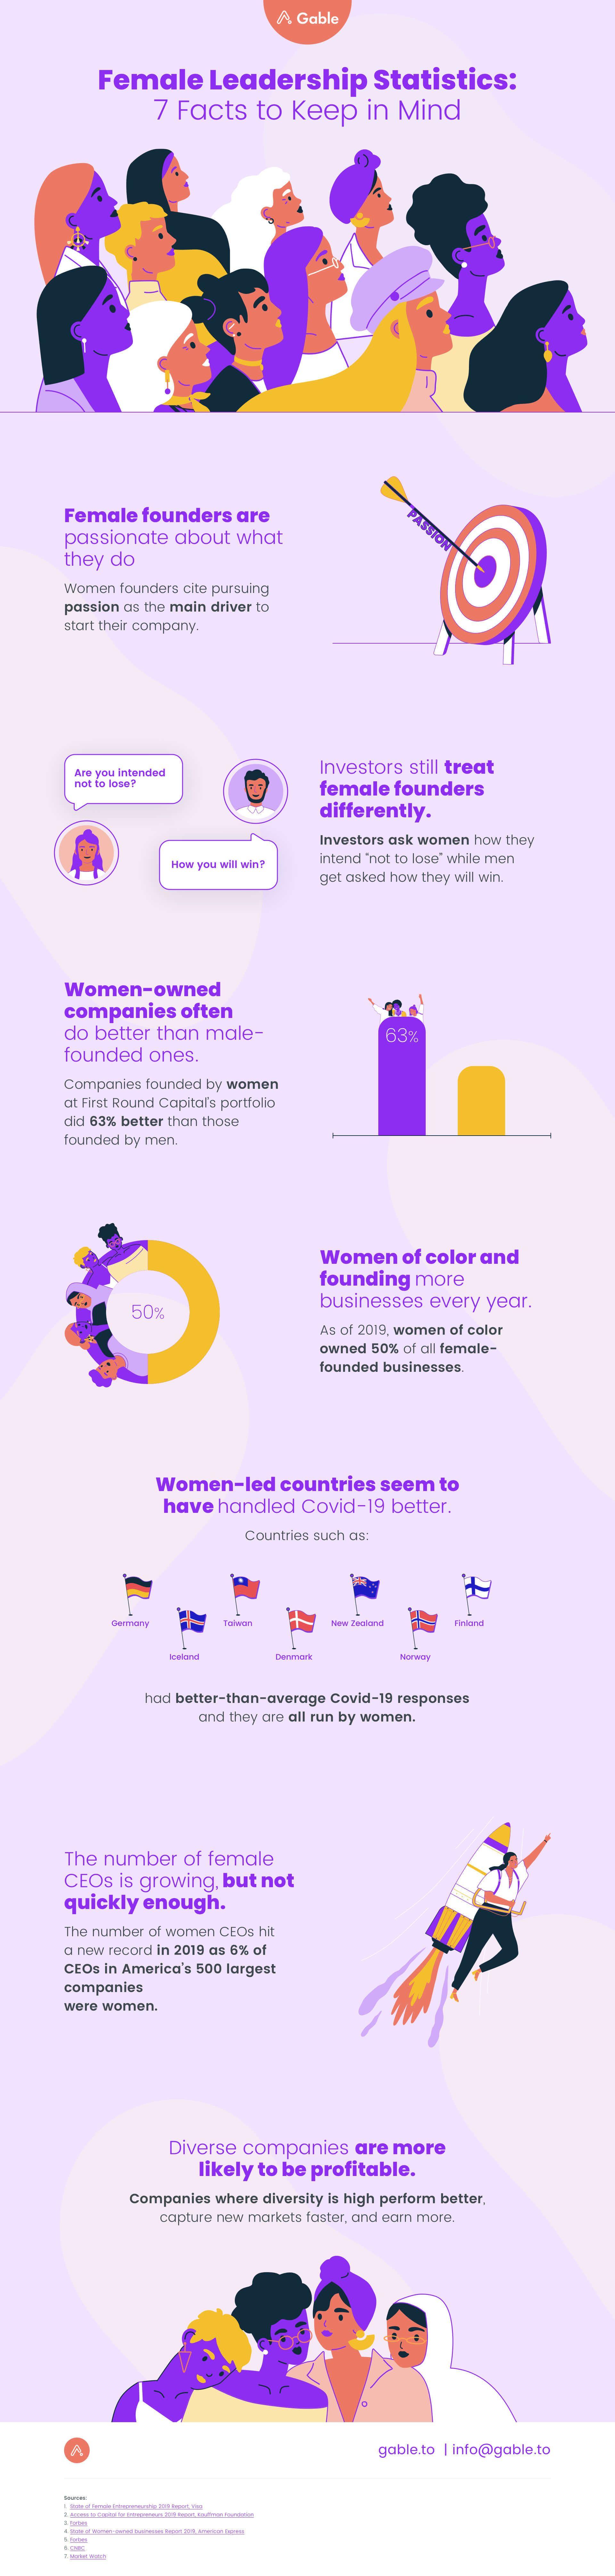 international women's day gable infographic